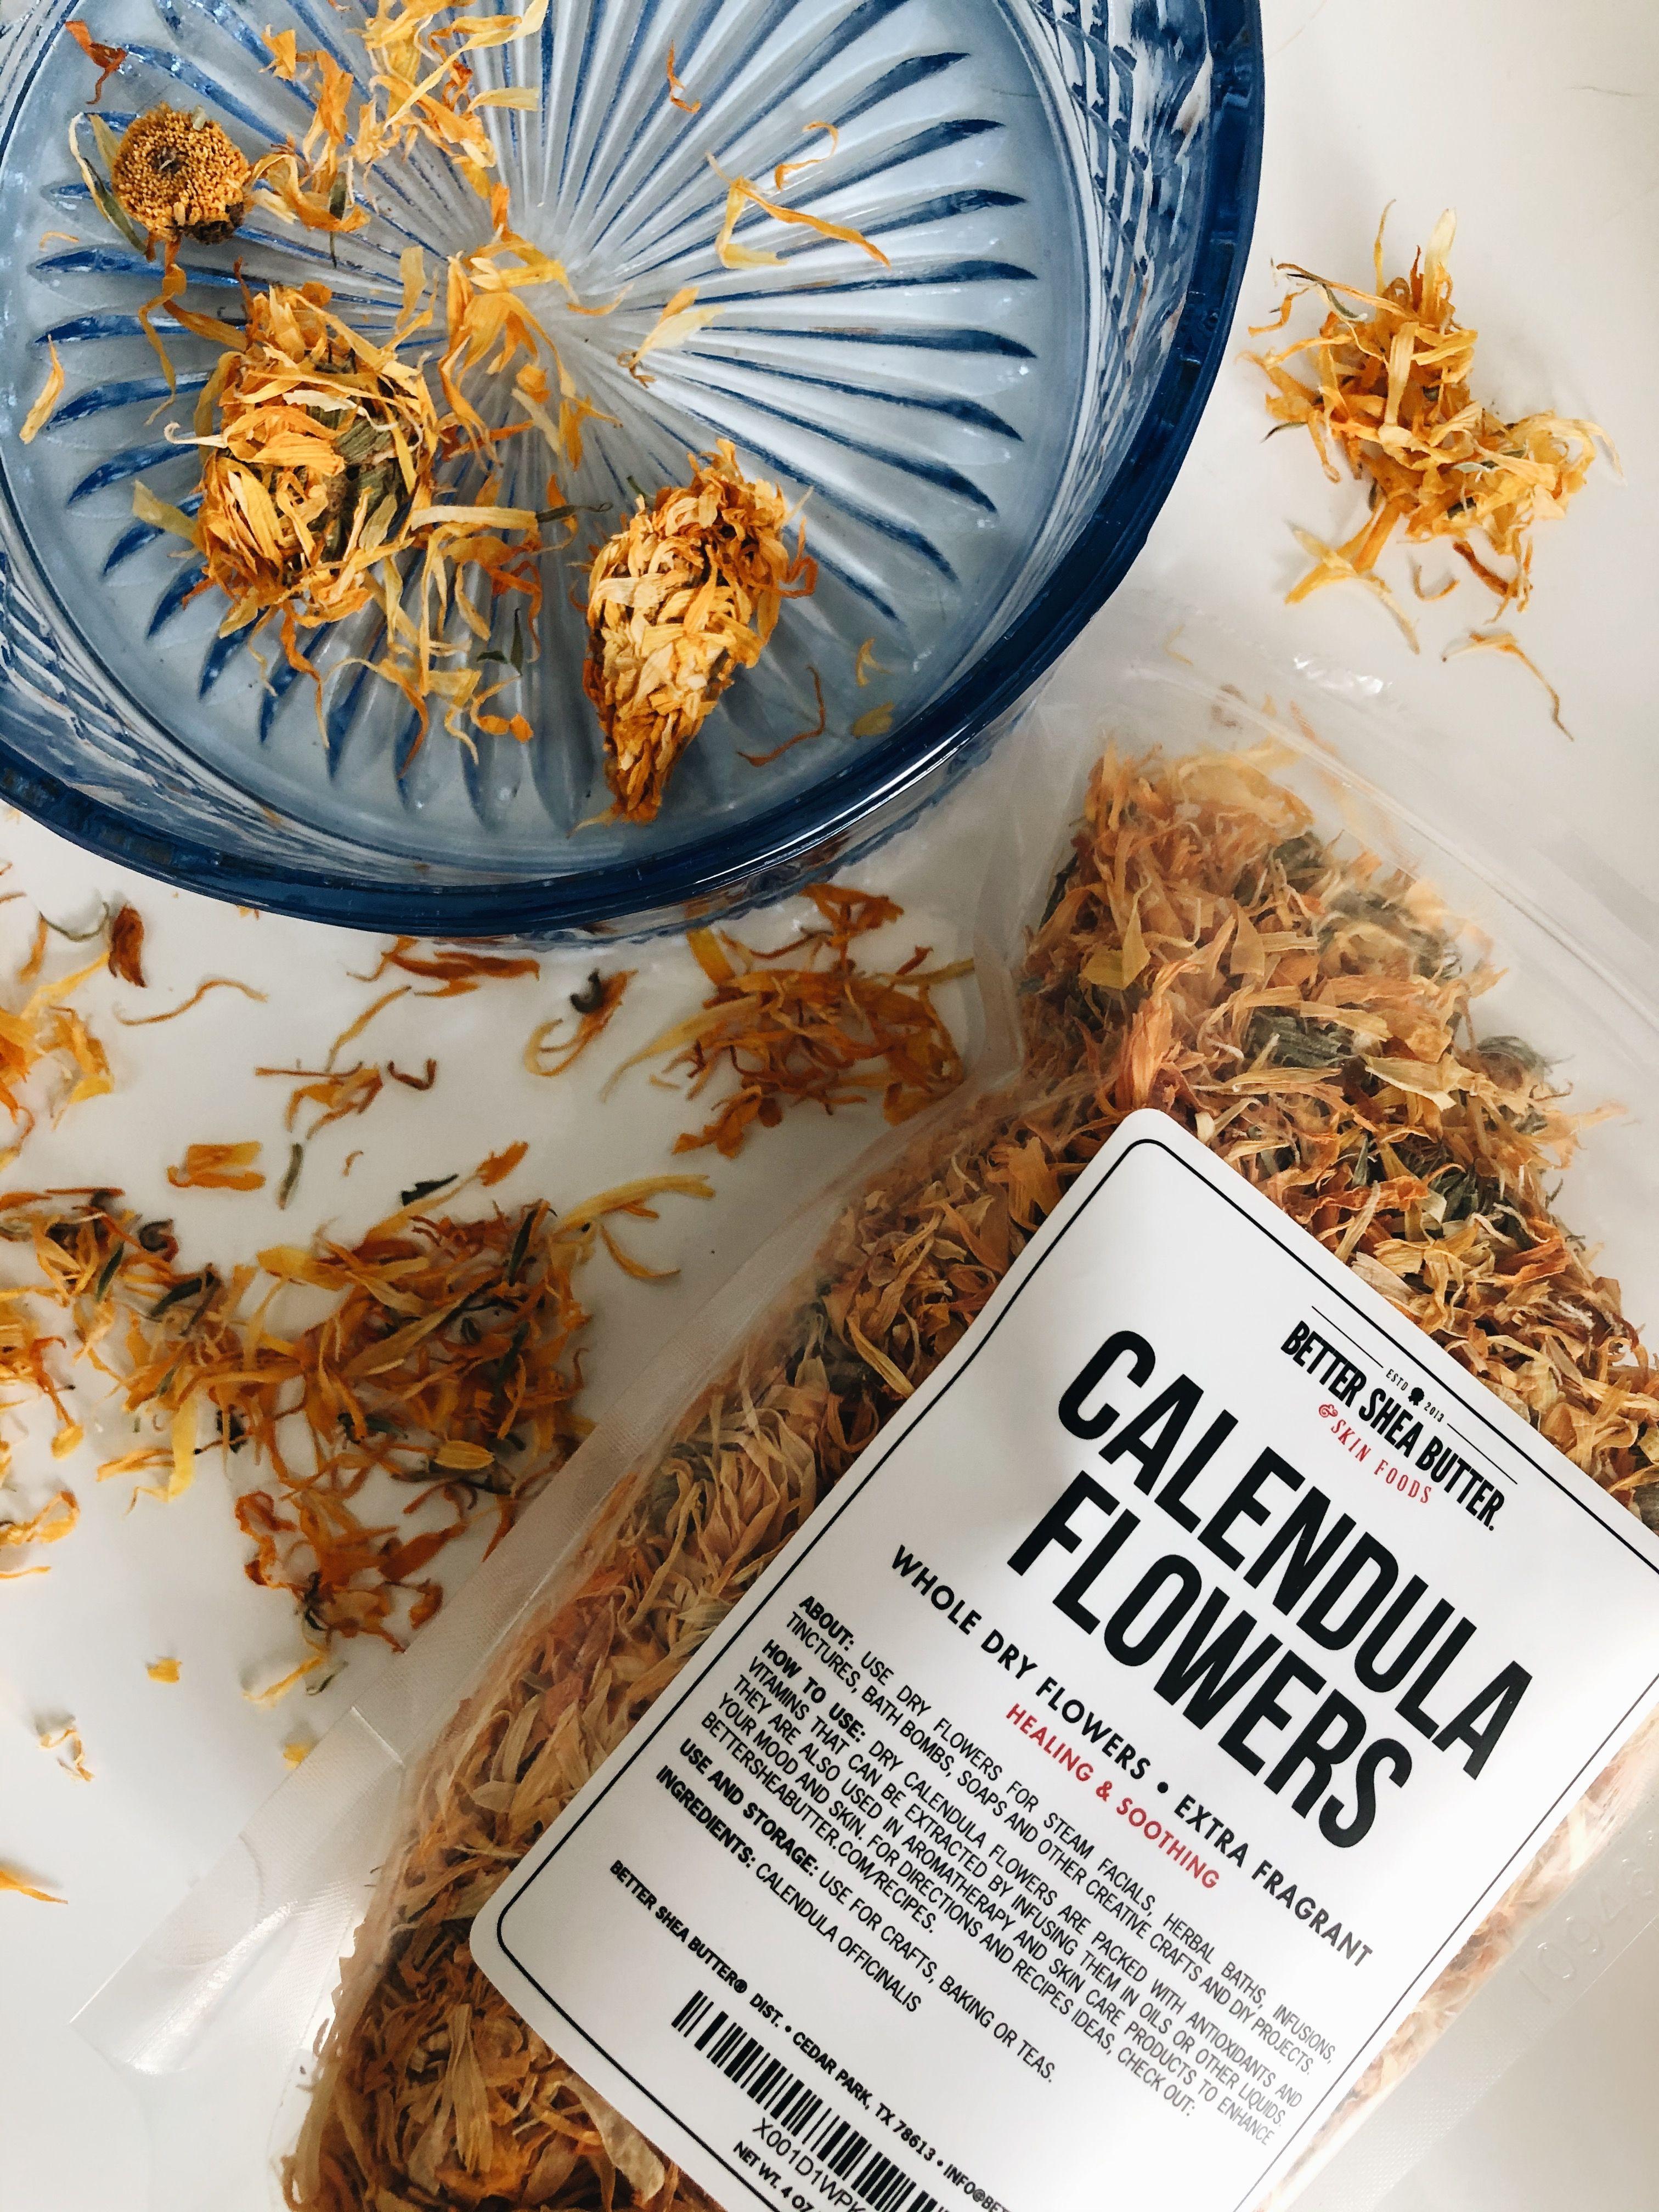 Dry Calendula Flowers Dried flowers, Calendula, Shea butter